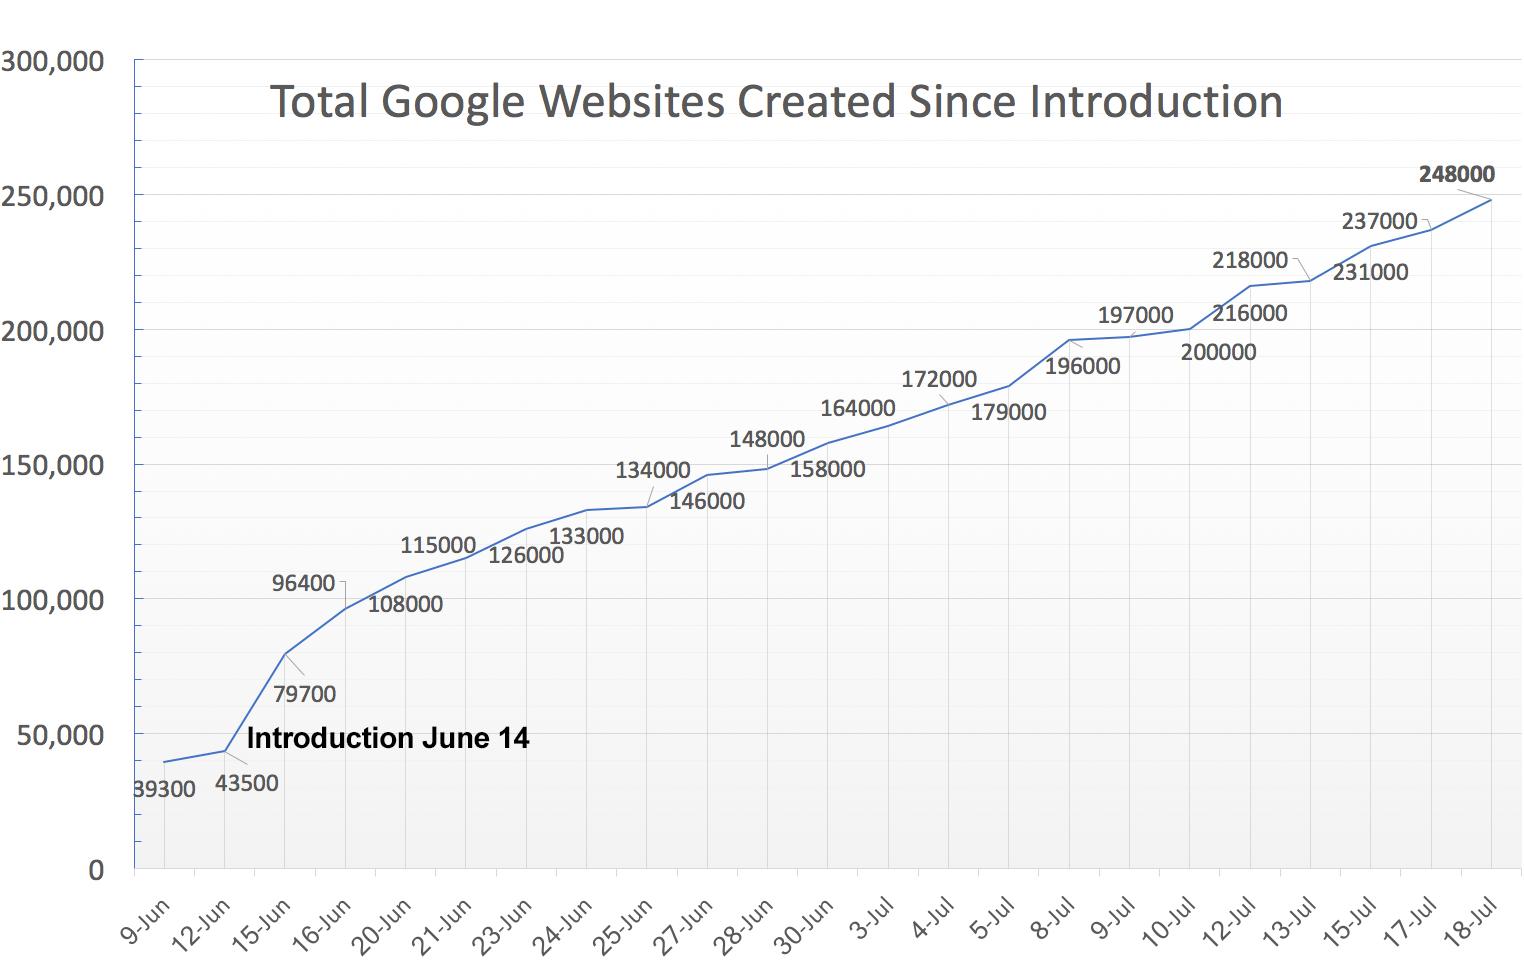 http://blumenthals.com/blog/2017/07/18/google-websites-passes-250000-sites-created/